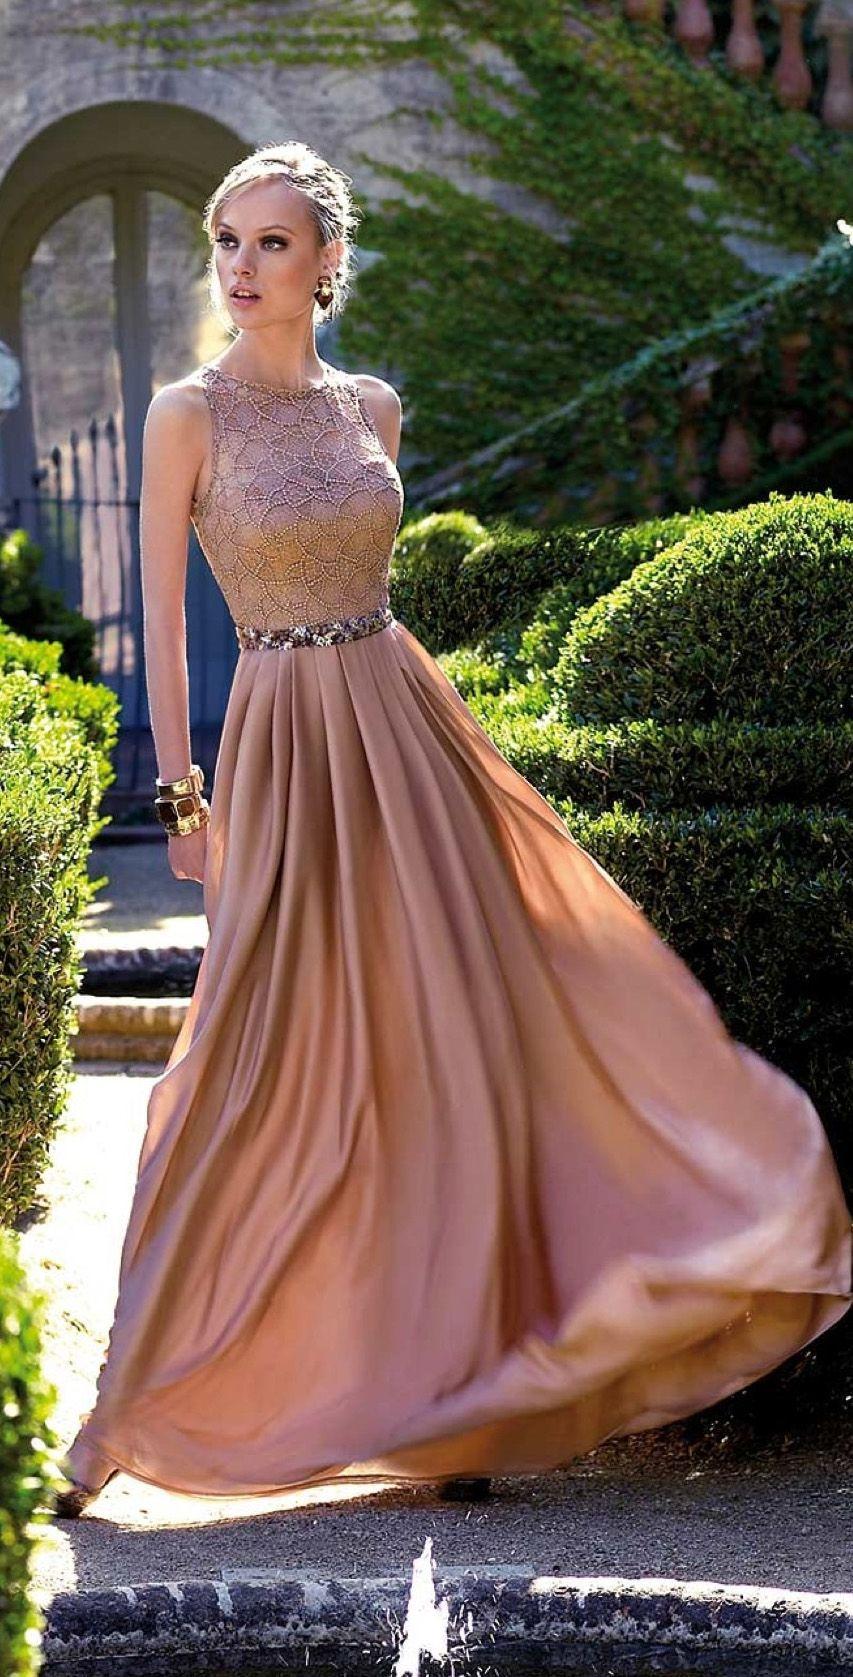 Long prom dresses coral prom dresses sequin prom dresses prom